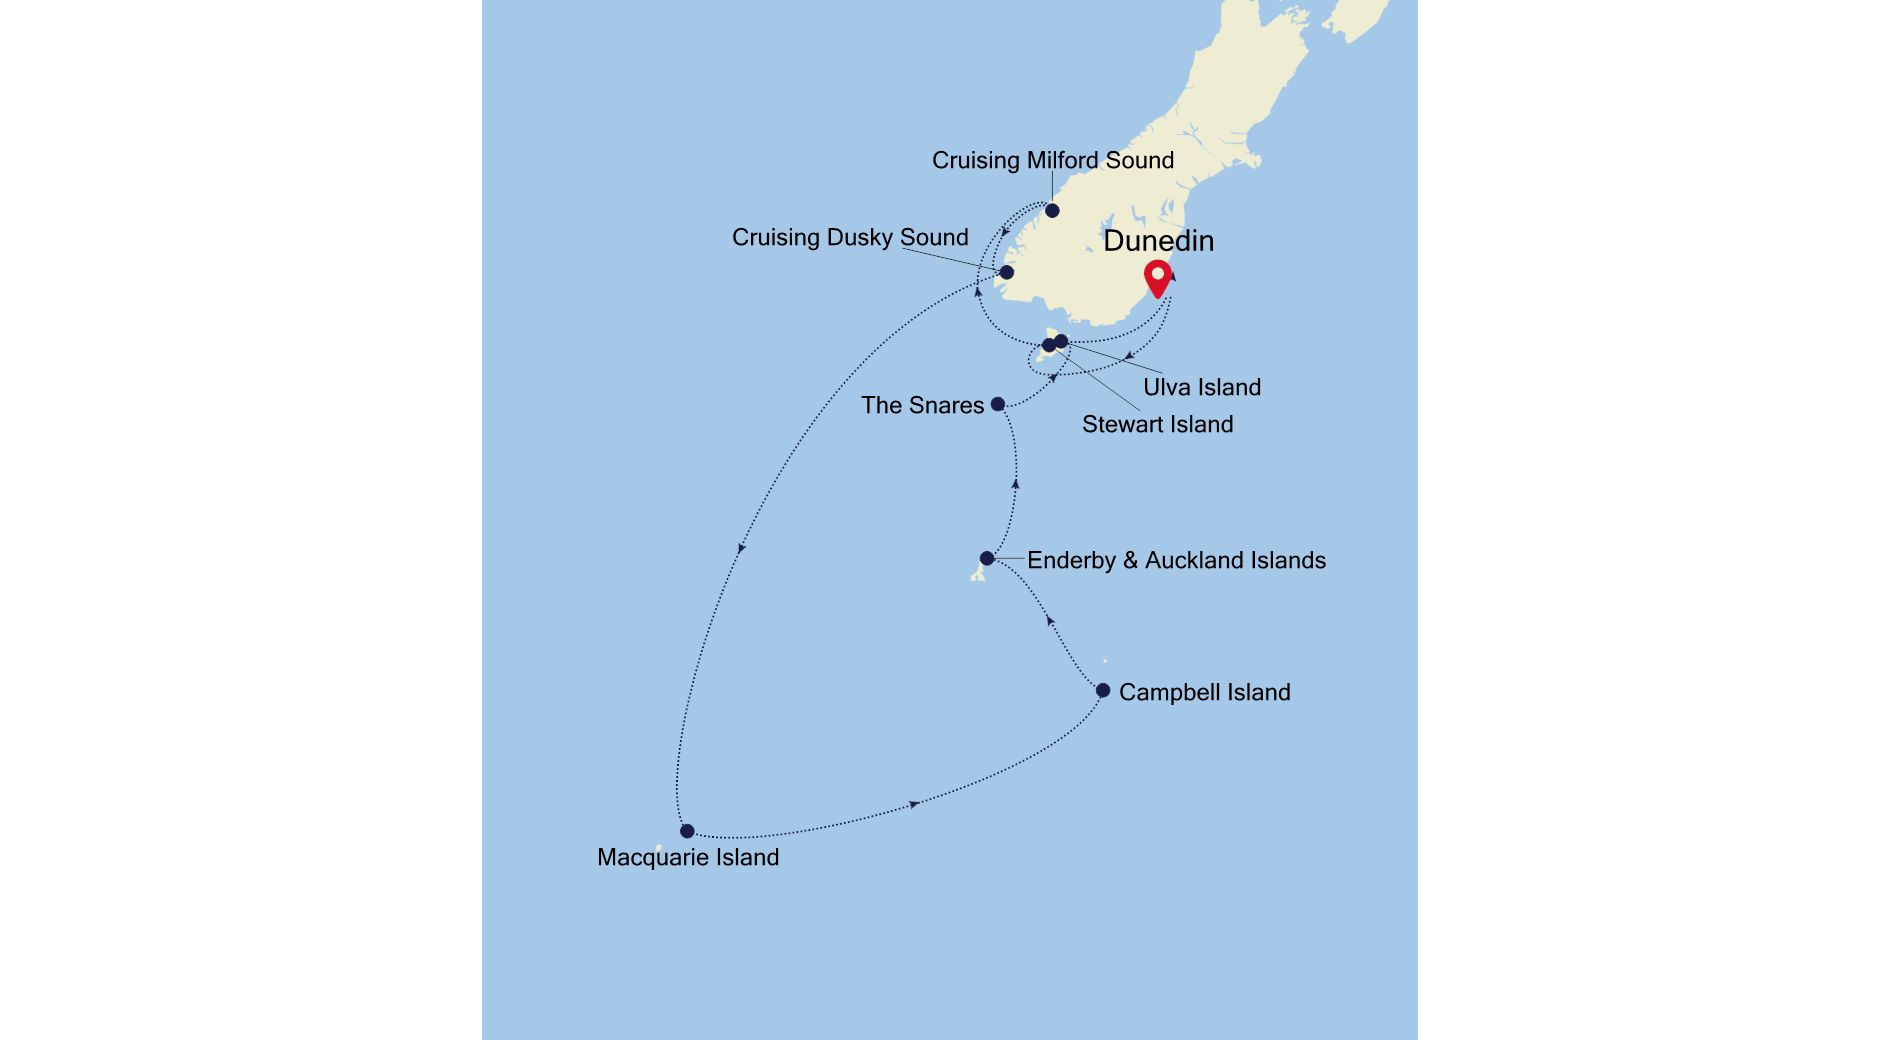 E1210104014 - Dunedin to Dunedin